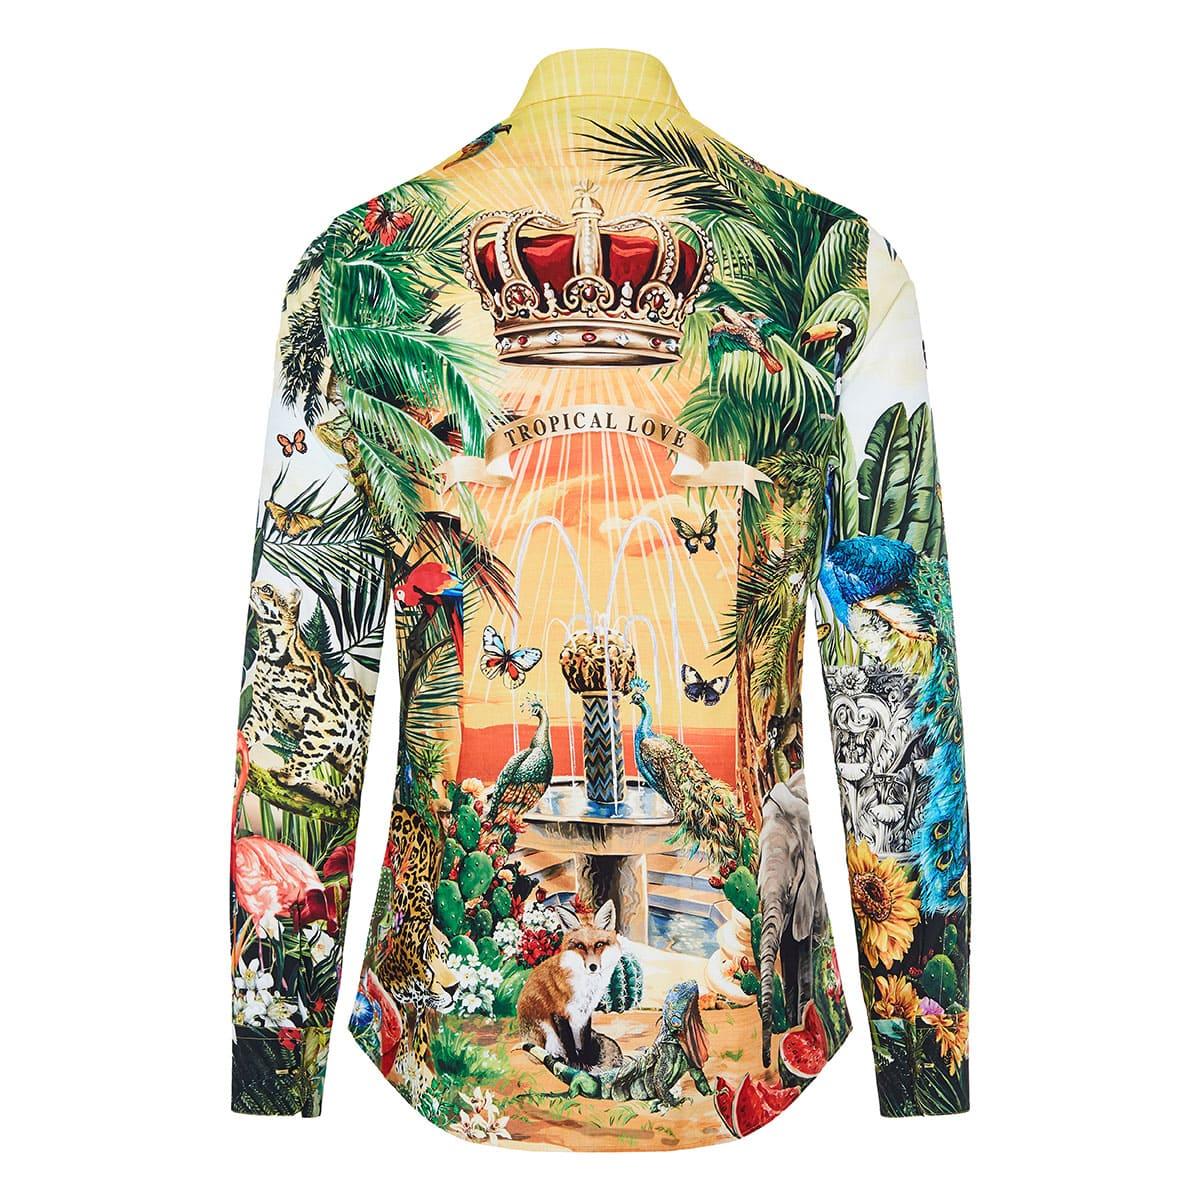 Tropical-printed cotton shirt